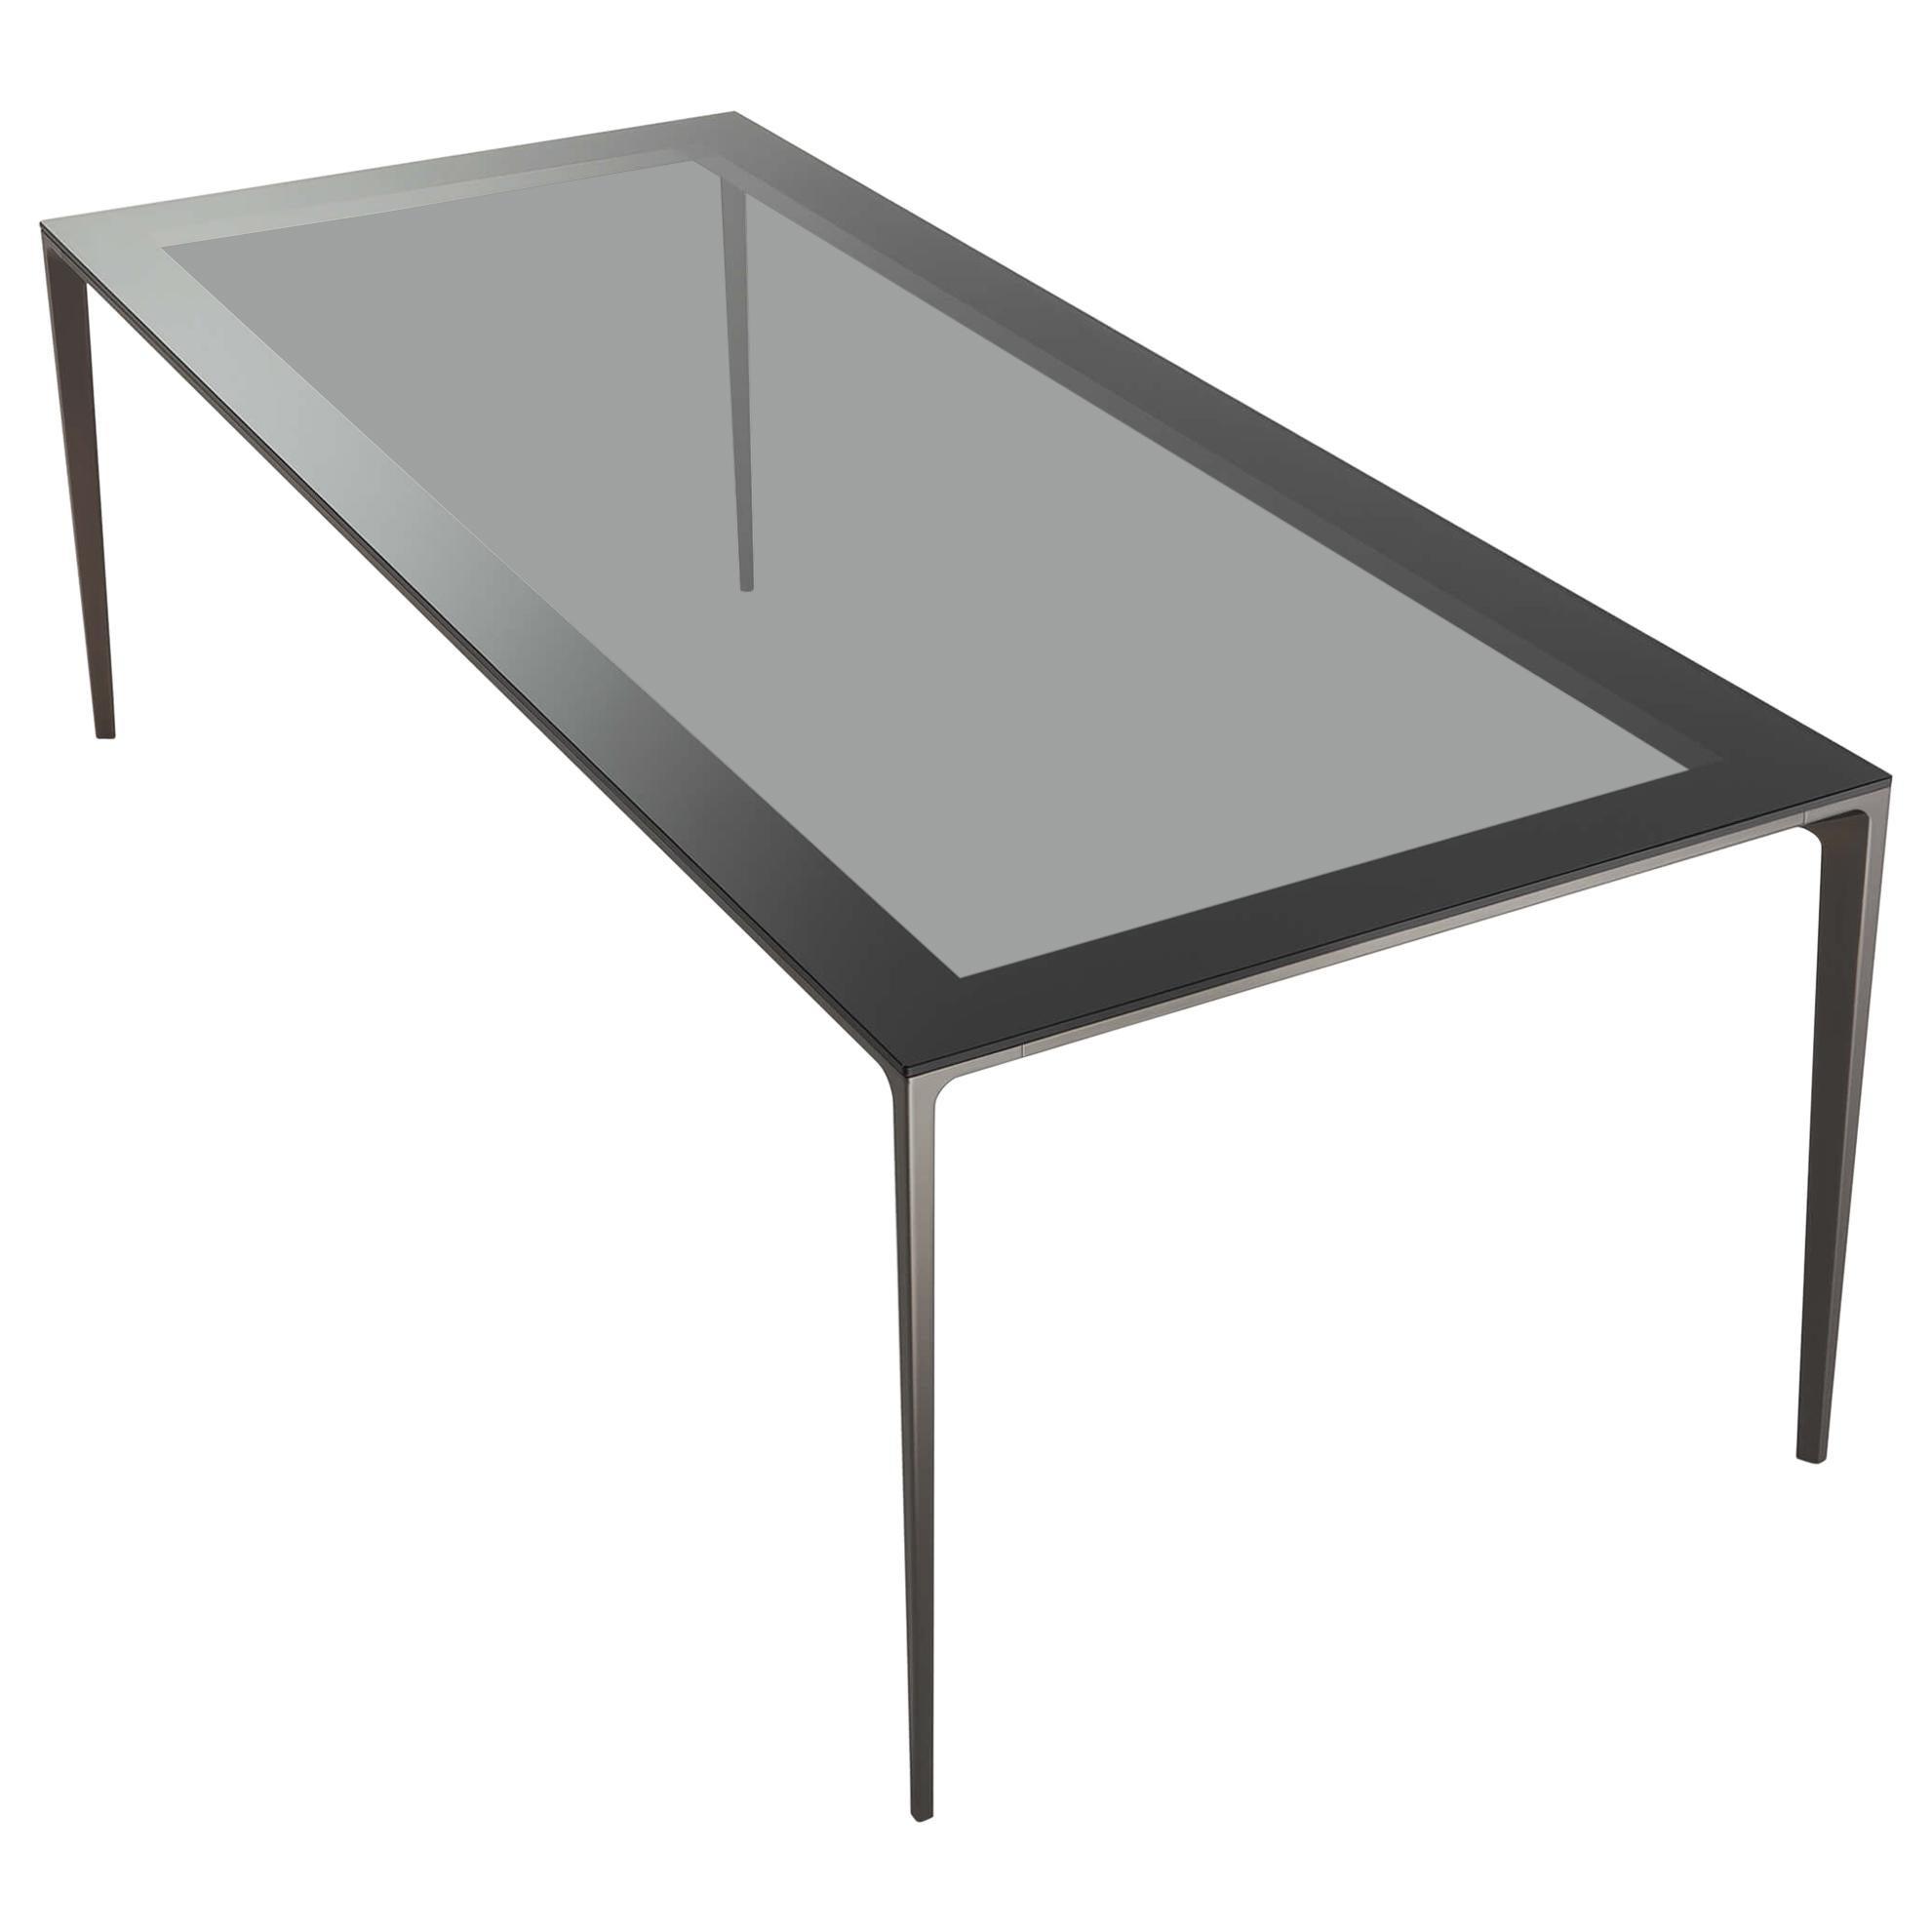 Italian Modern Glass and Aluminium Rectangular Table